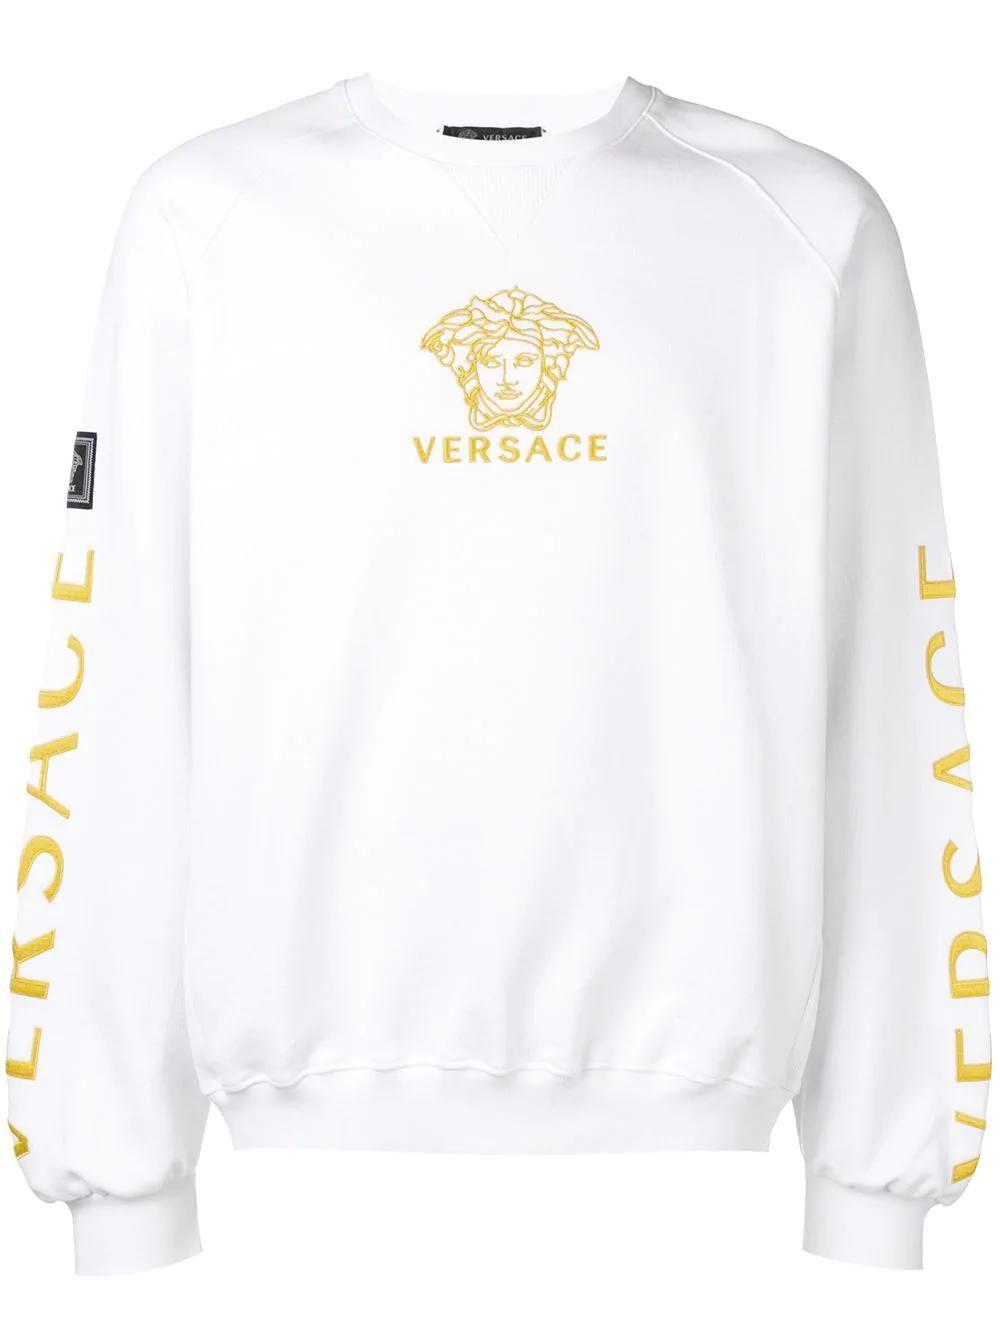 Versace 徽标刺绣套头衫 Versace Cloth Sweatshirts Versace Versace T Shirt